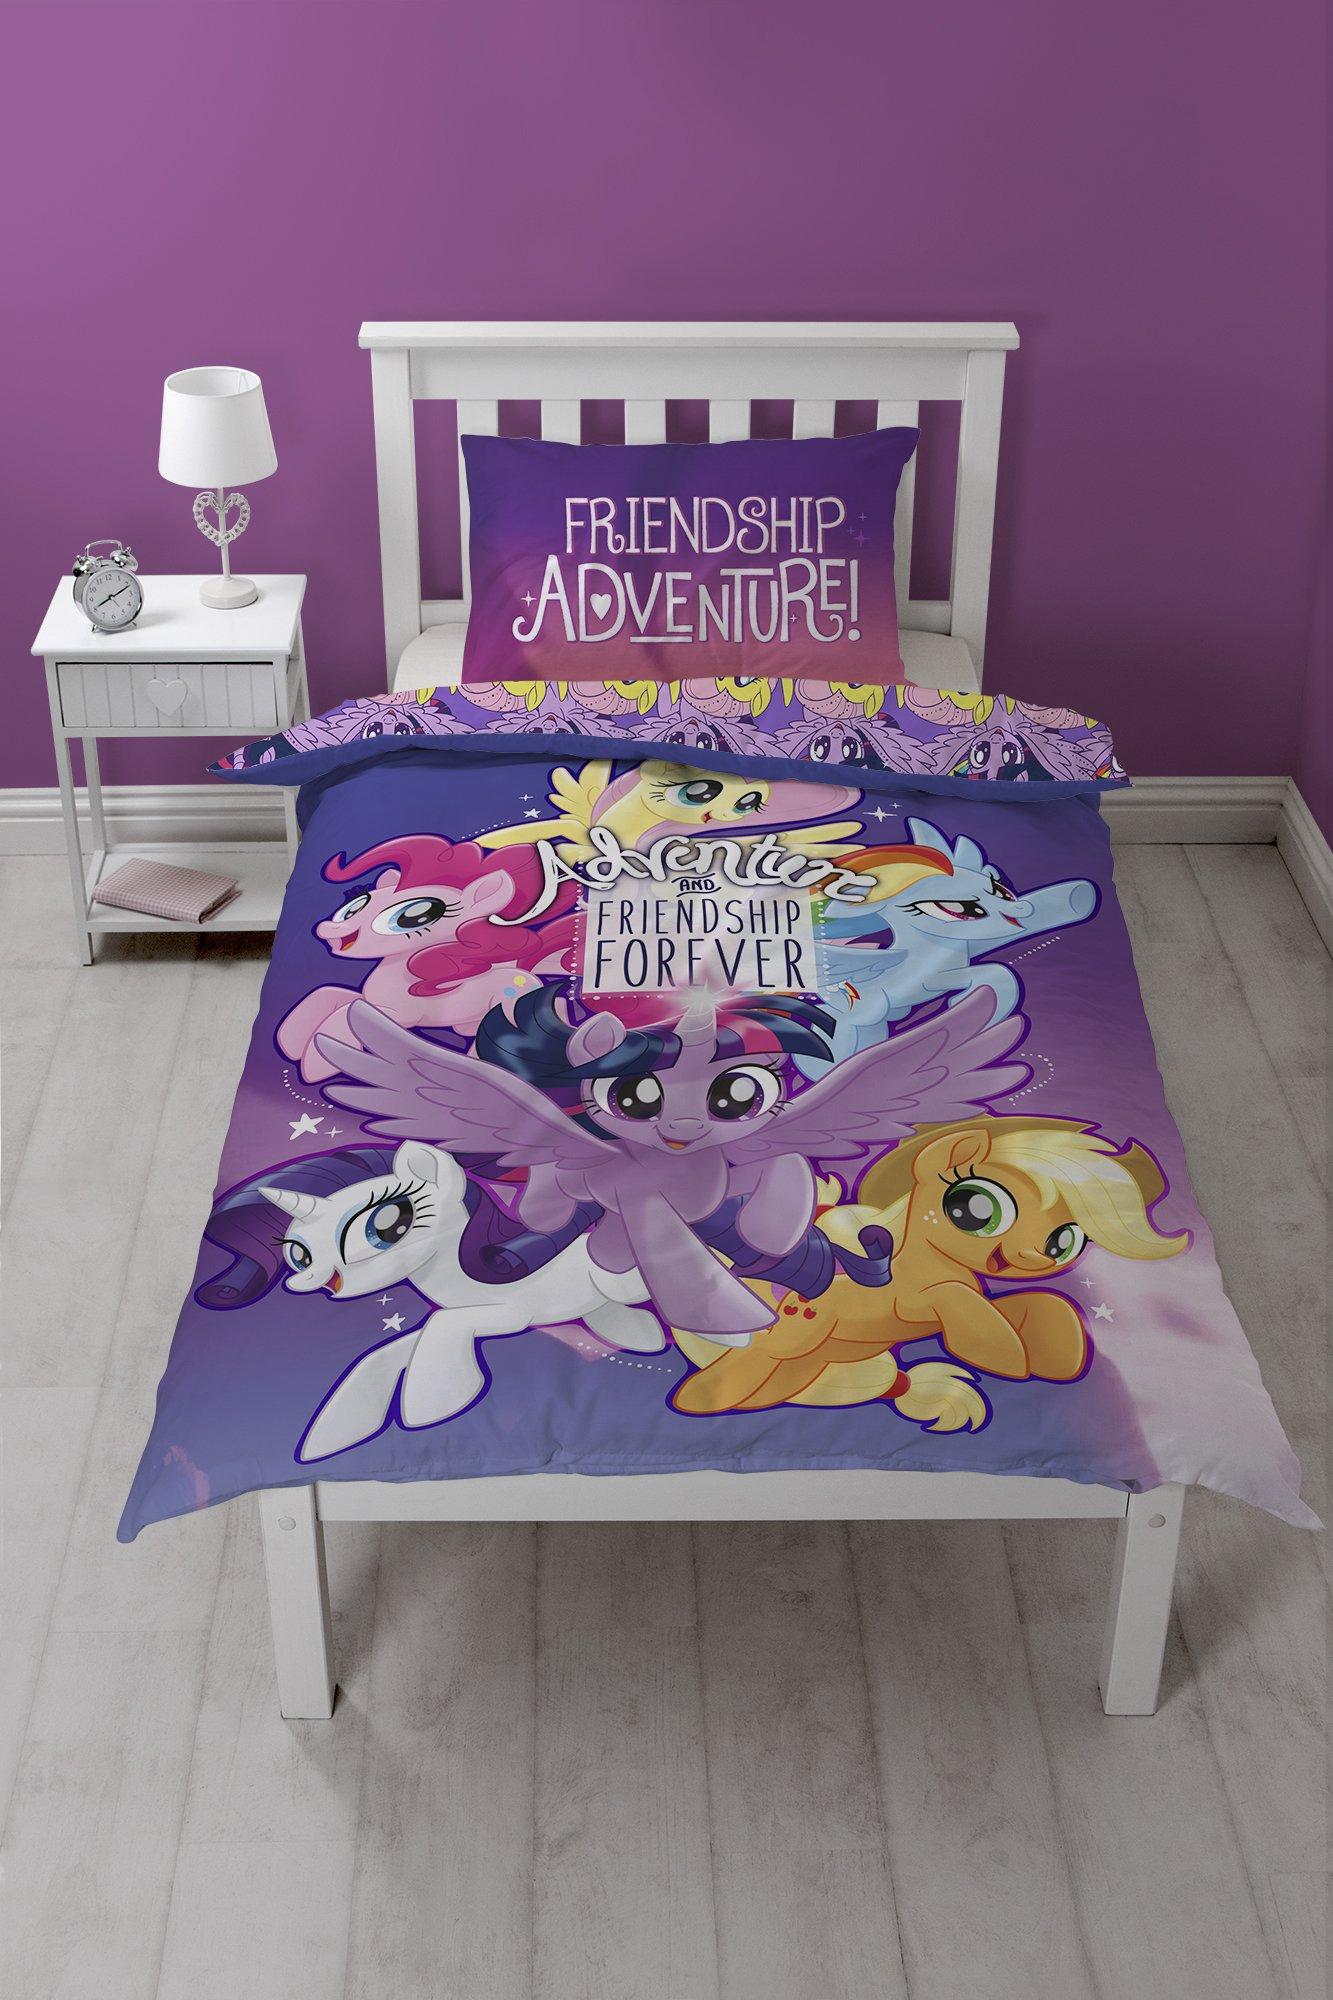 My Little Pony Movie Adventure and Friendship Forever Reversible Single Duvet Cover Set